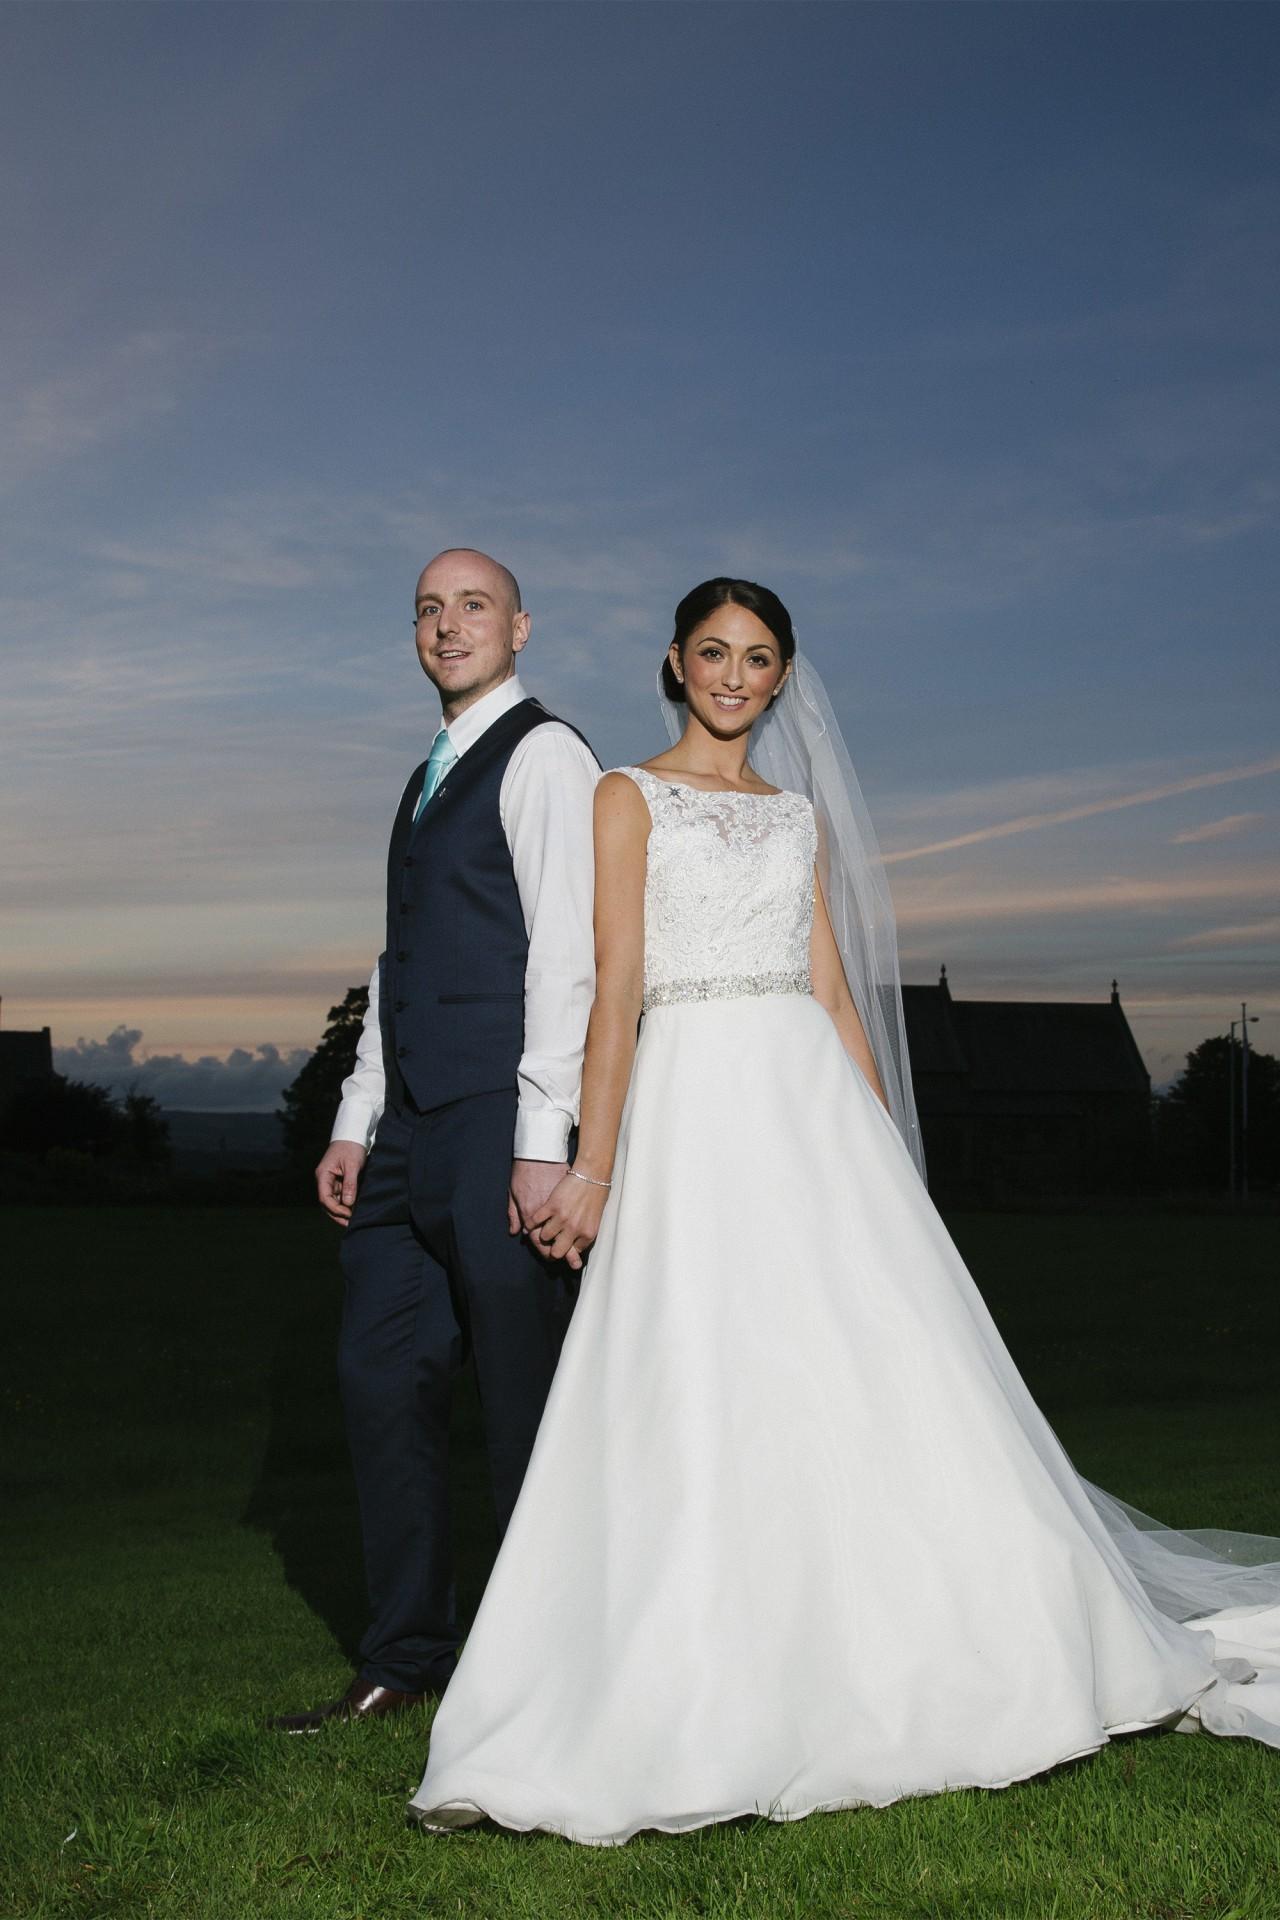 Michaela_David_Under-the-Sea-Wedding_SBS_035